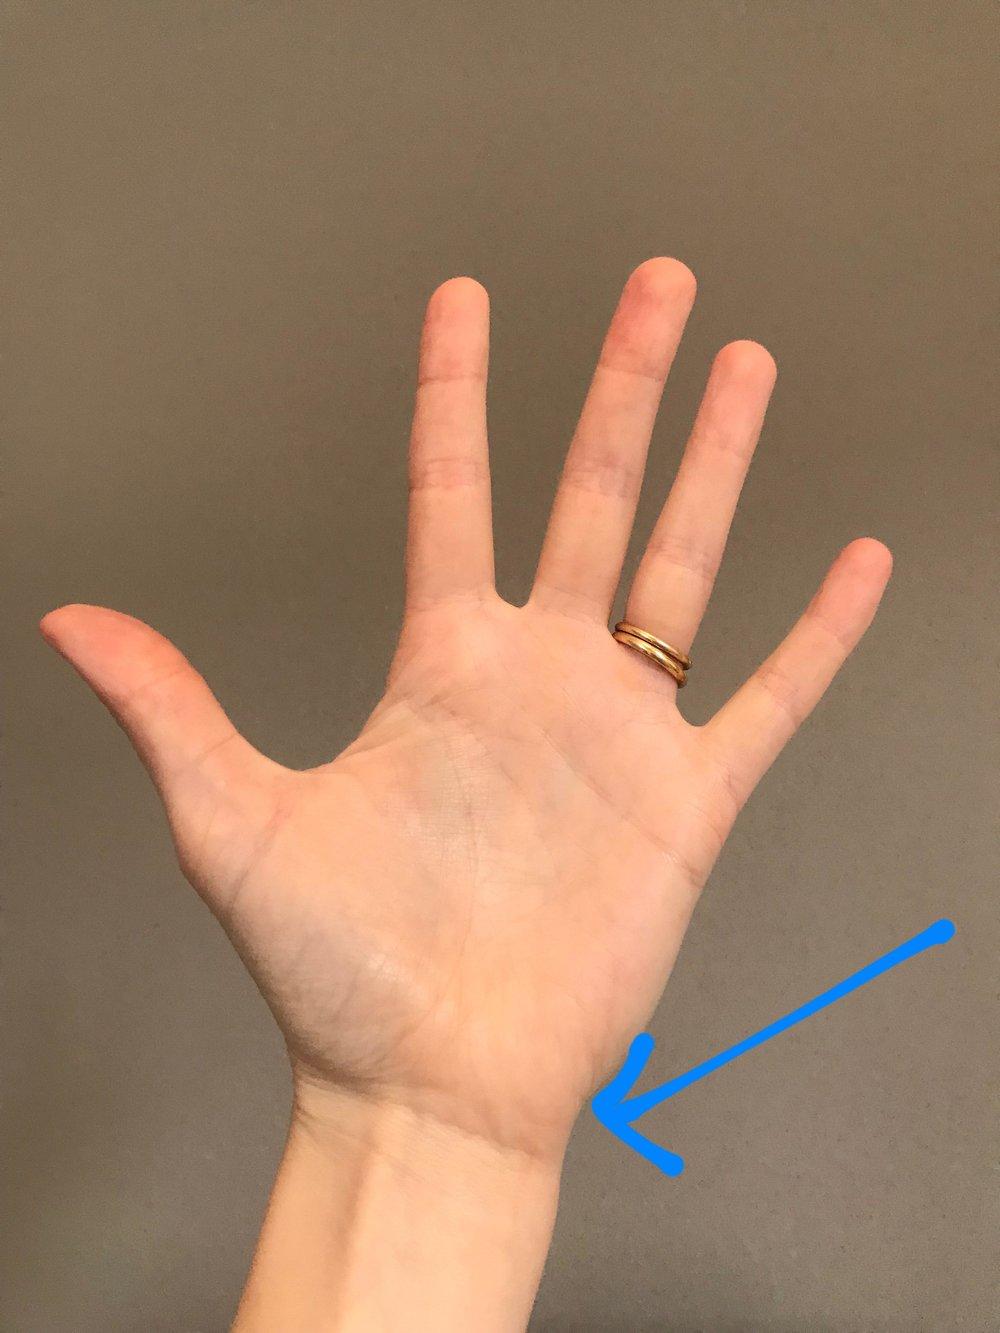 crack wrist when rotating it